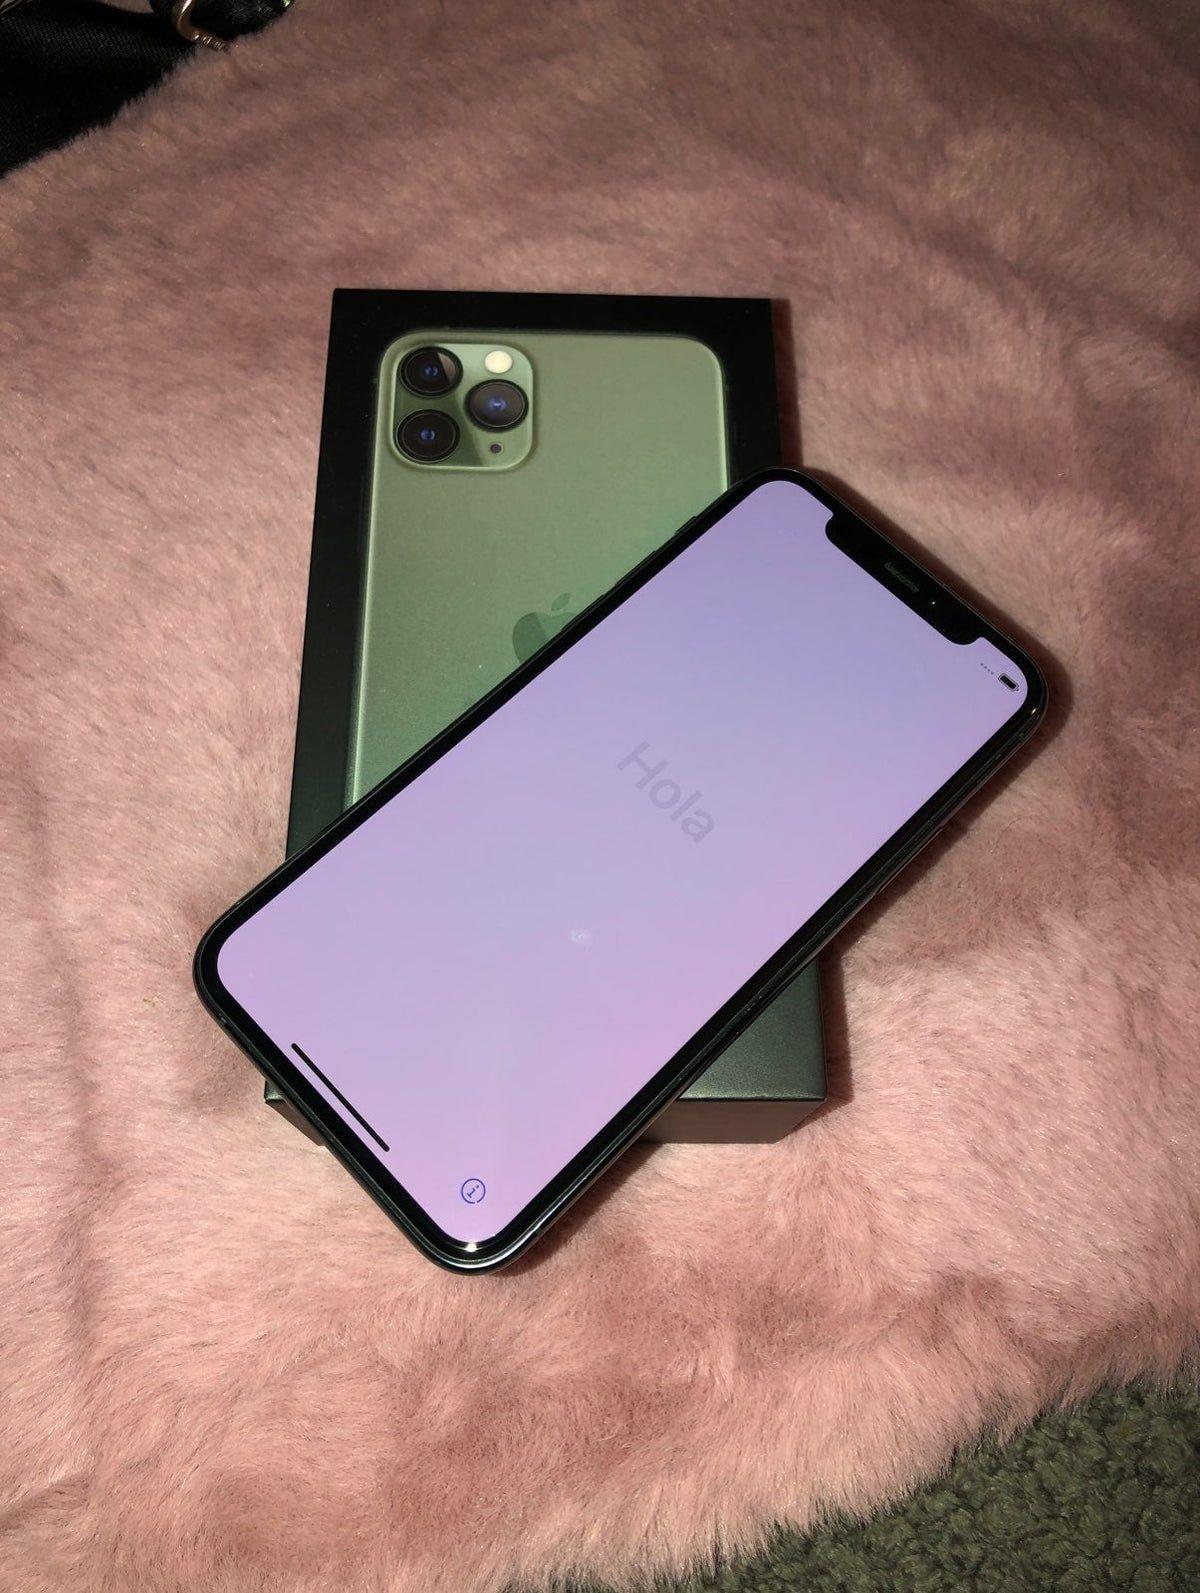 Iphone 11 Pro Max Midnight Green 64 Gb Iphone 11 Pro Max Midnight Green Iphone 11 Iphone